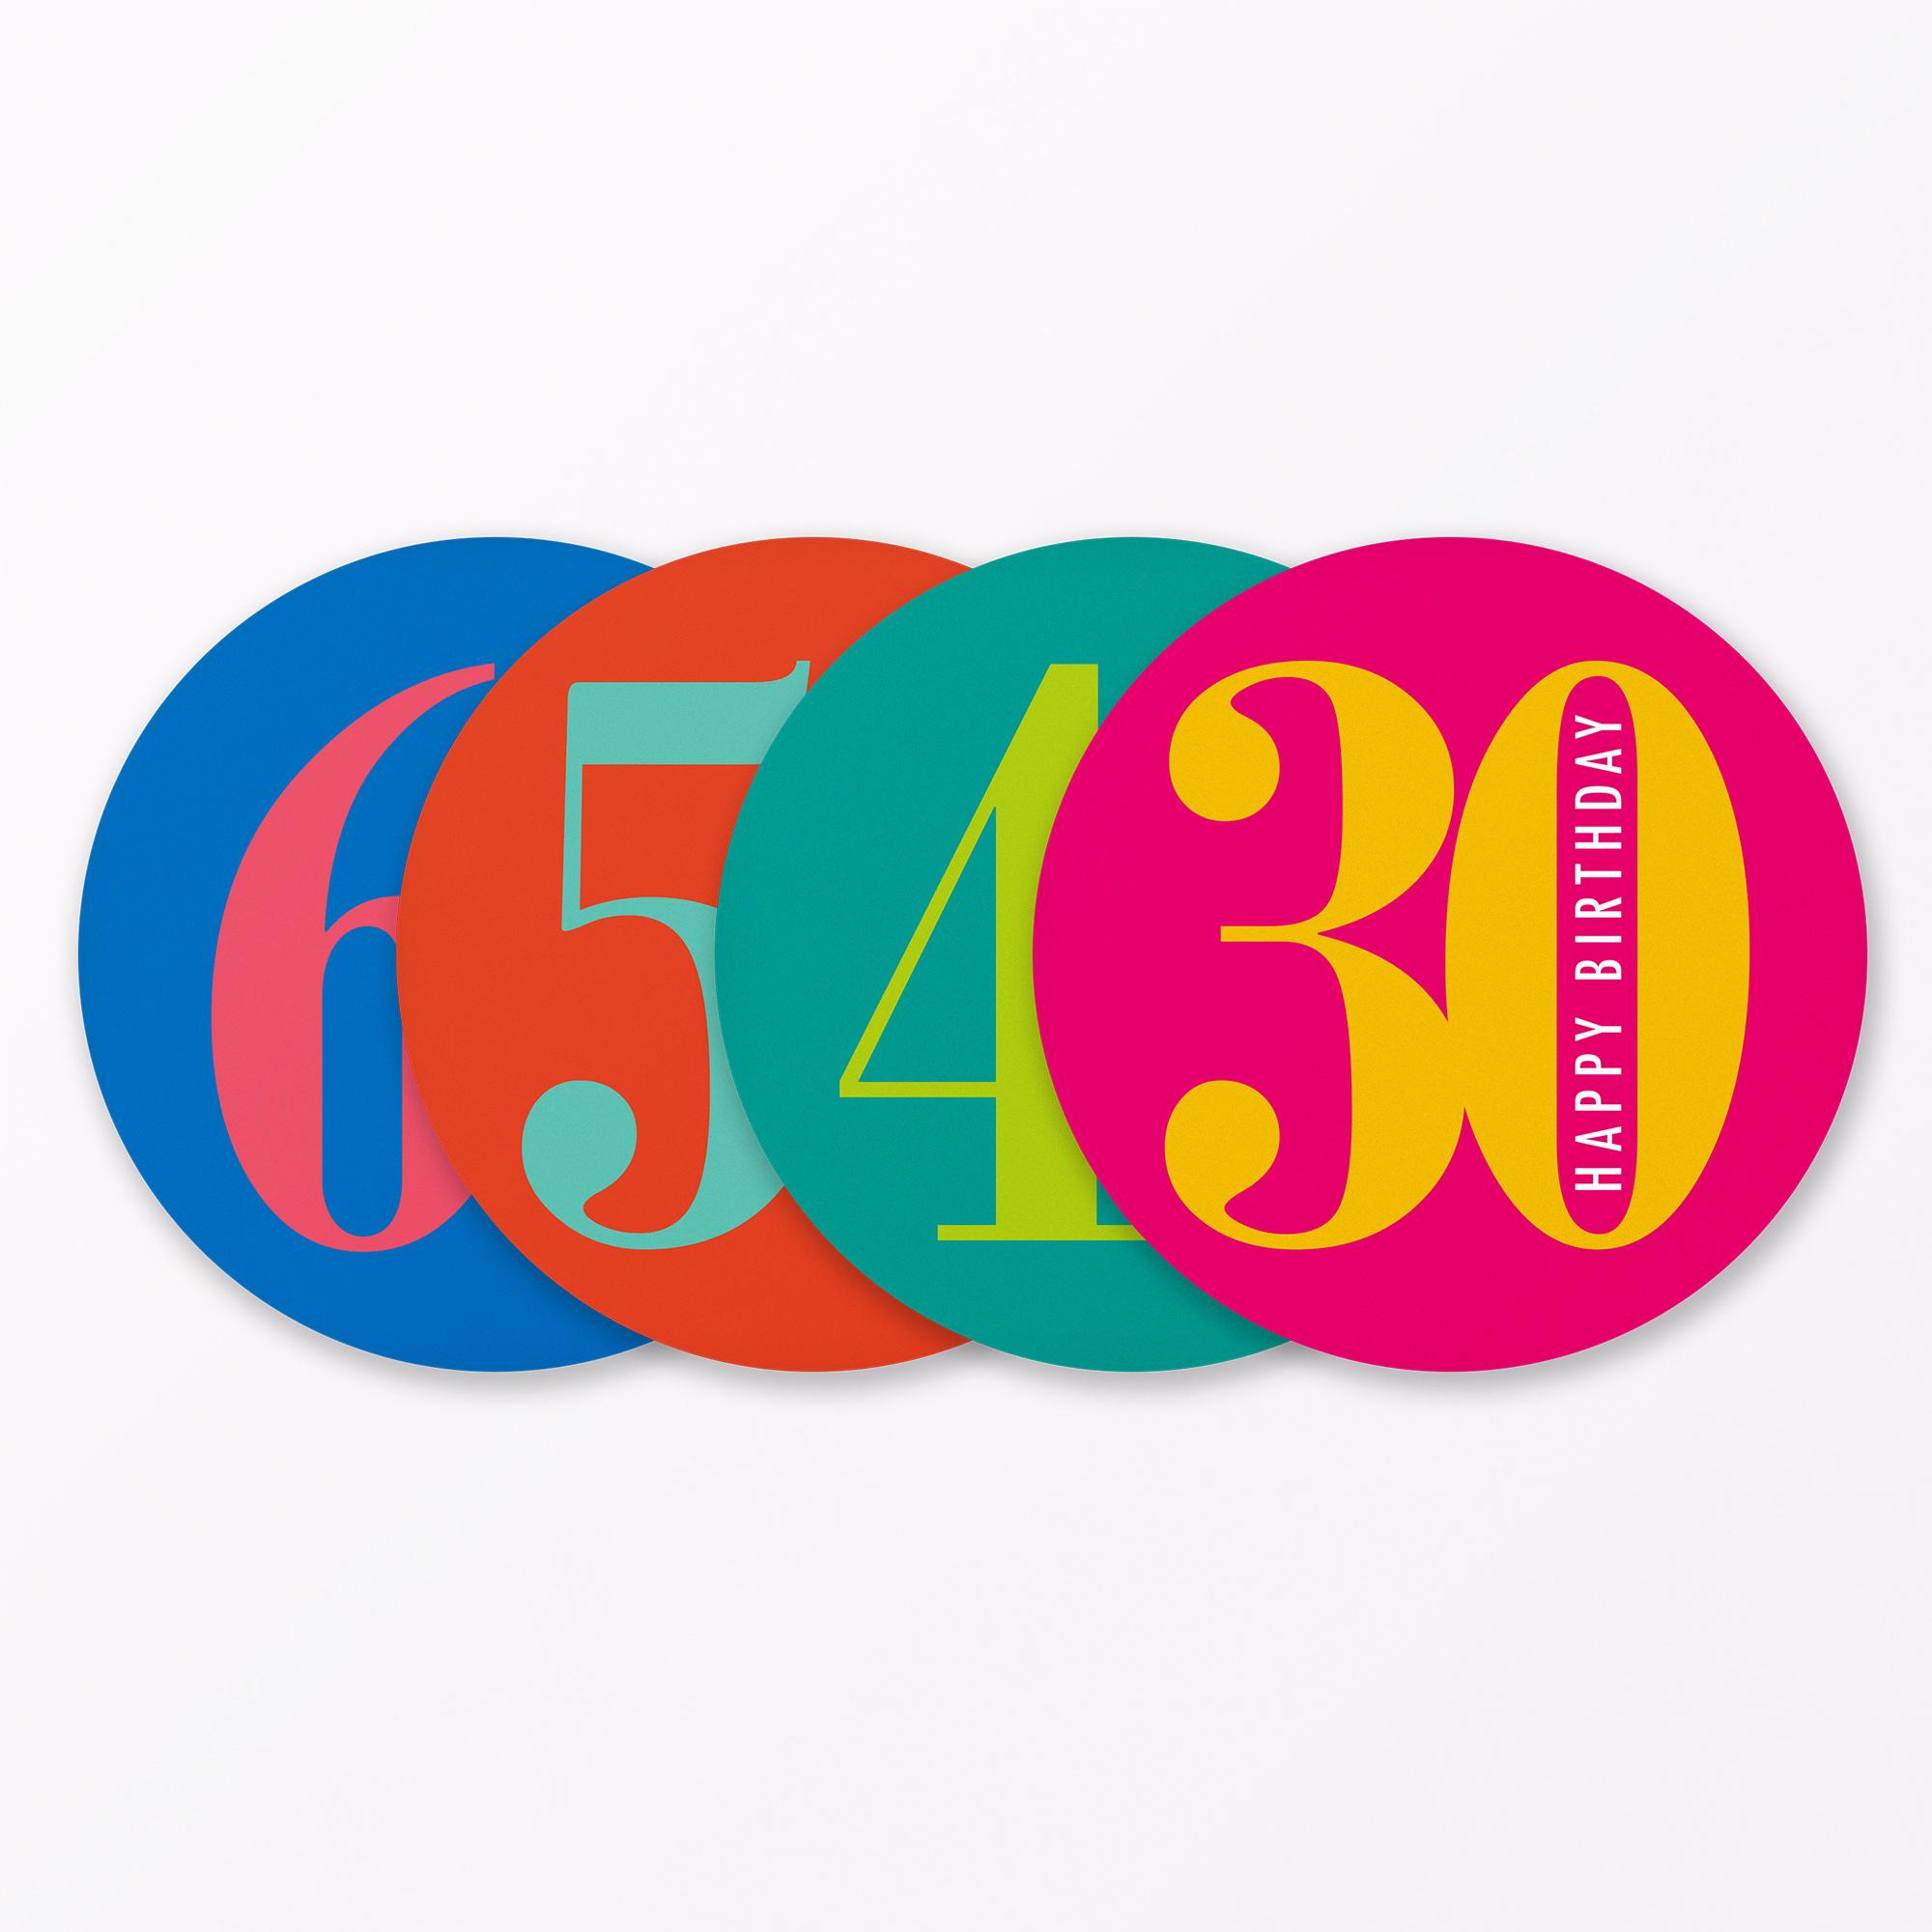 4 Teiliges Set Geburtstagskarte Runder Geburtstag 30 40 50 60